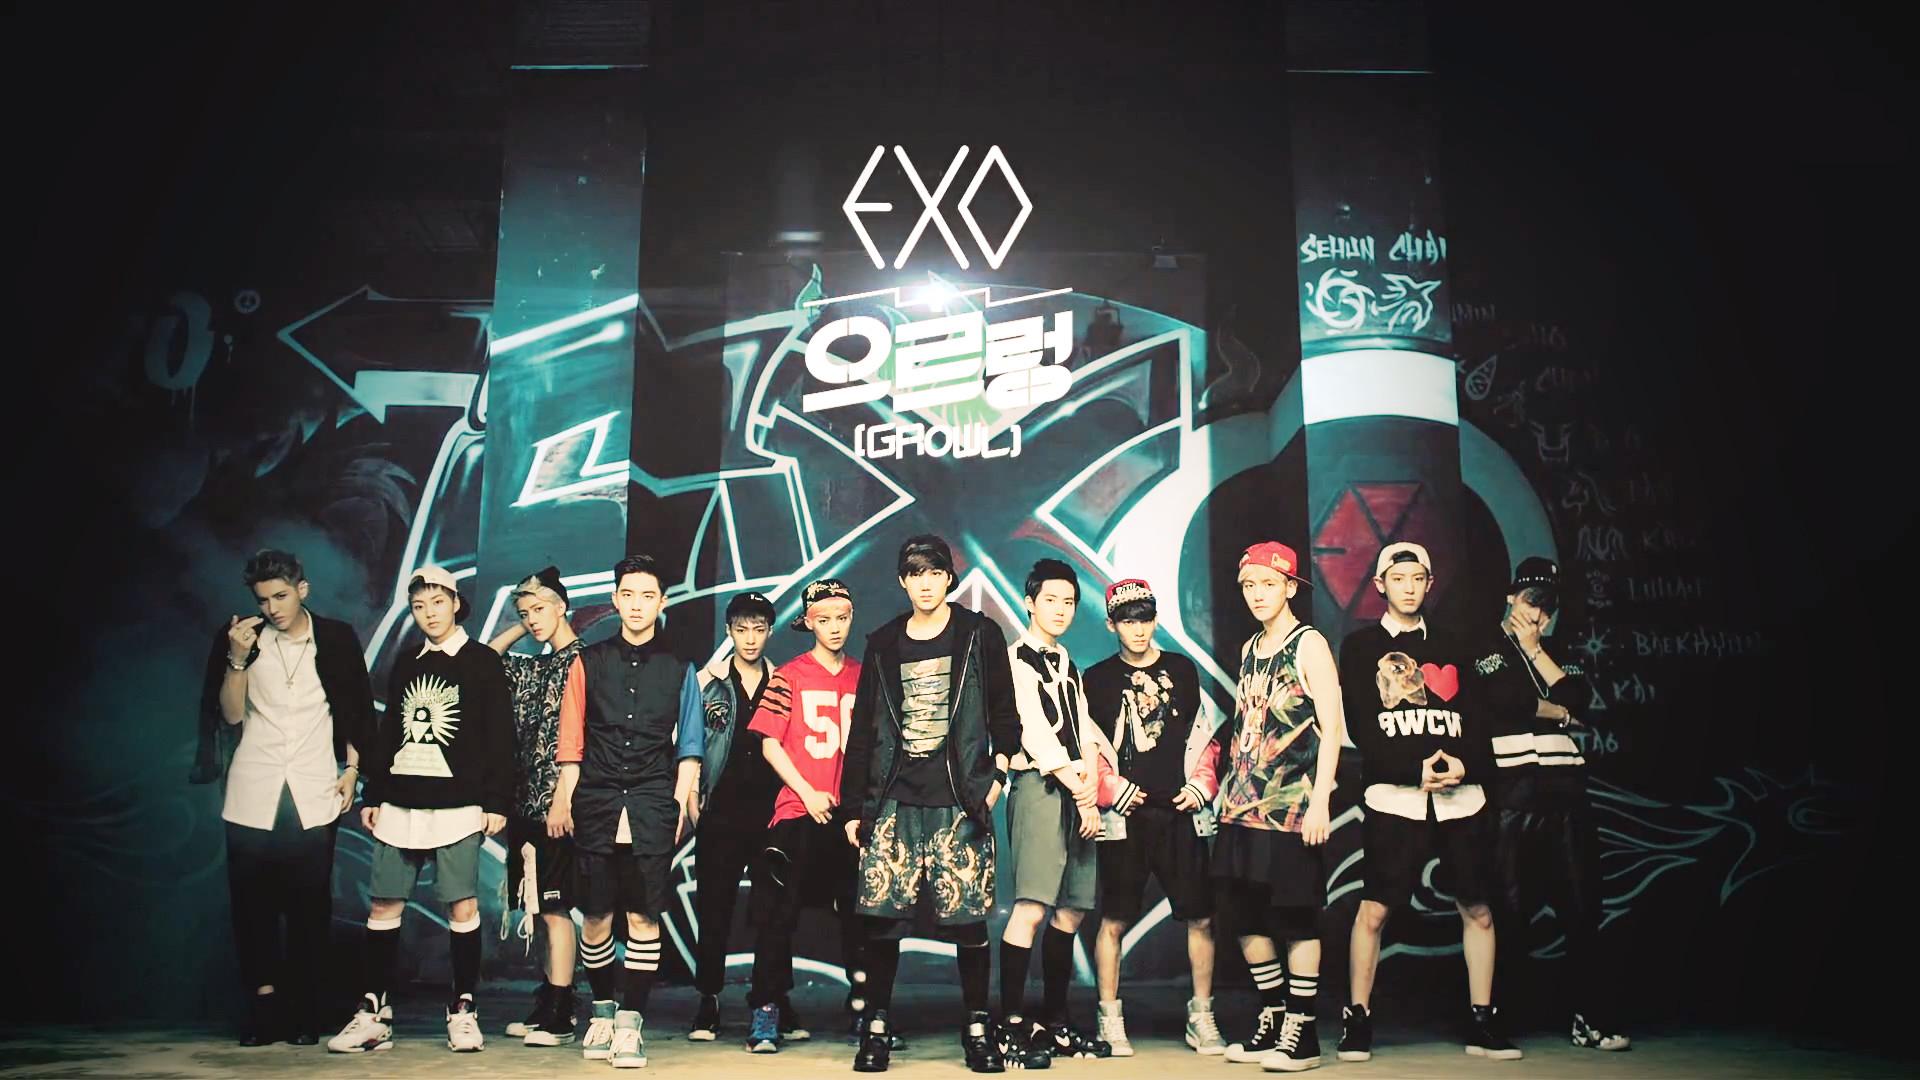 exo logo wallpaper 77 images